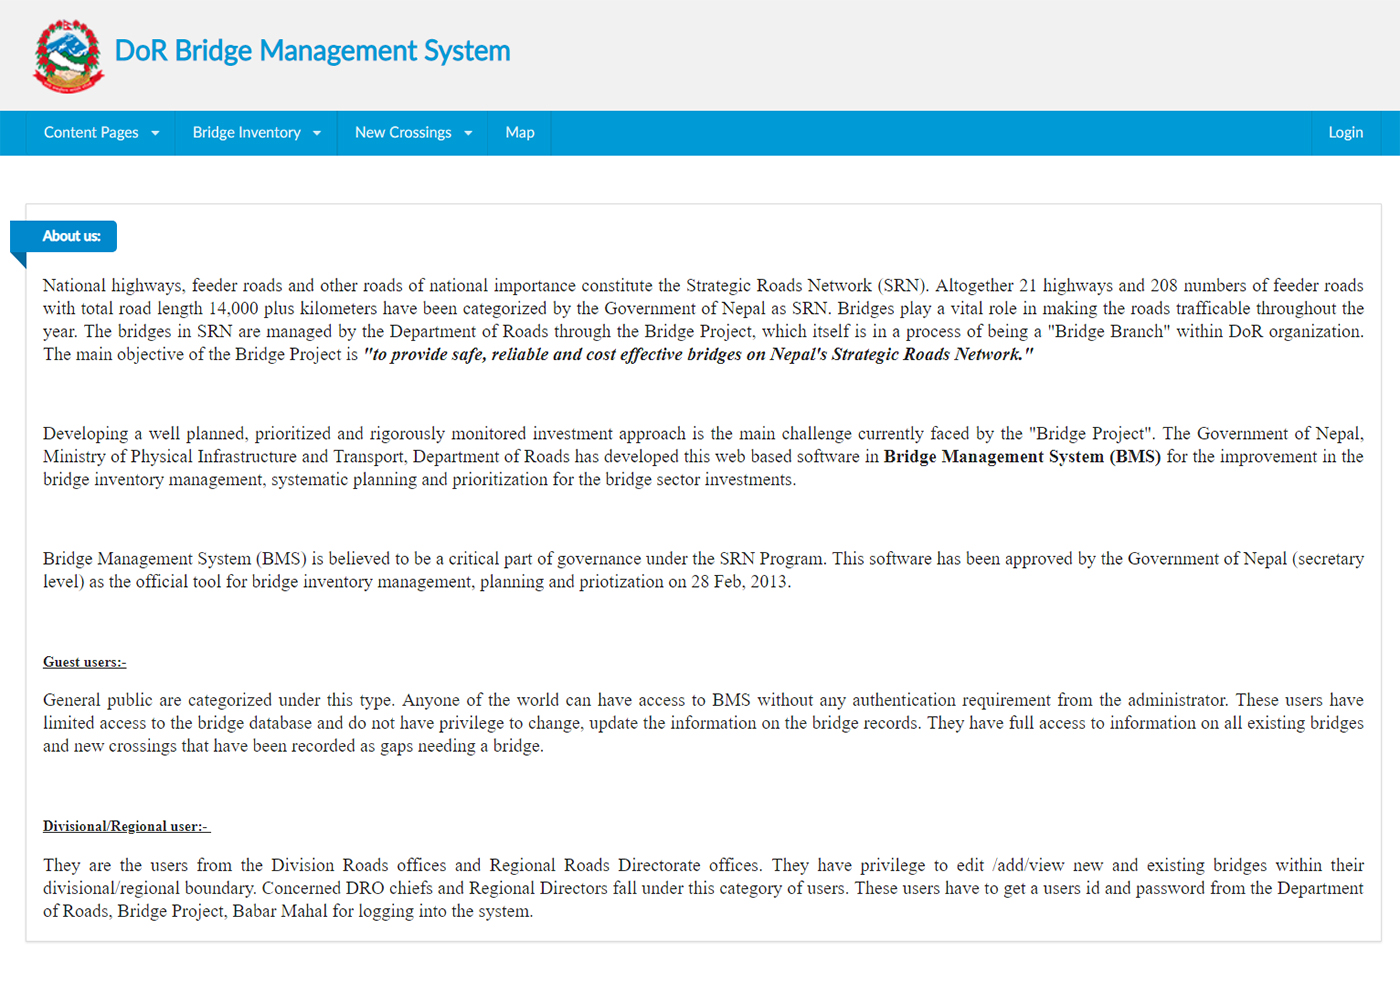 DOR Bridge Management System